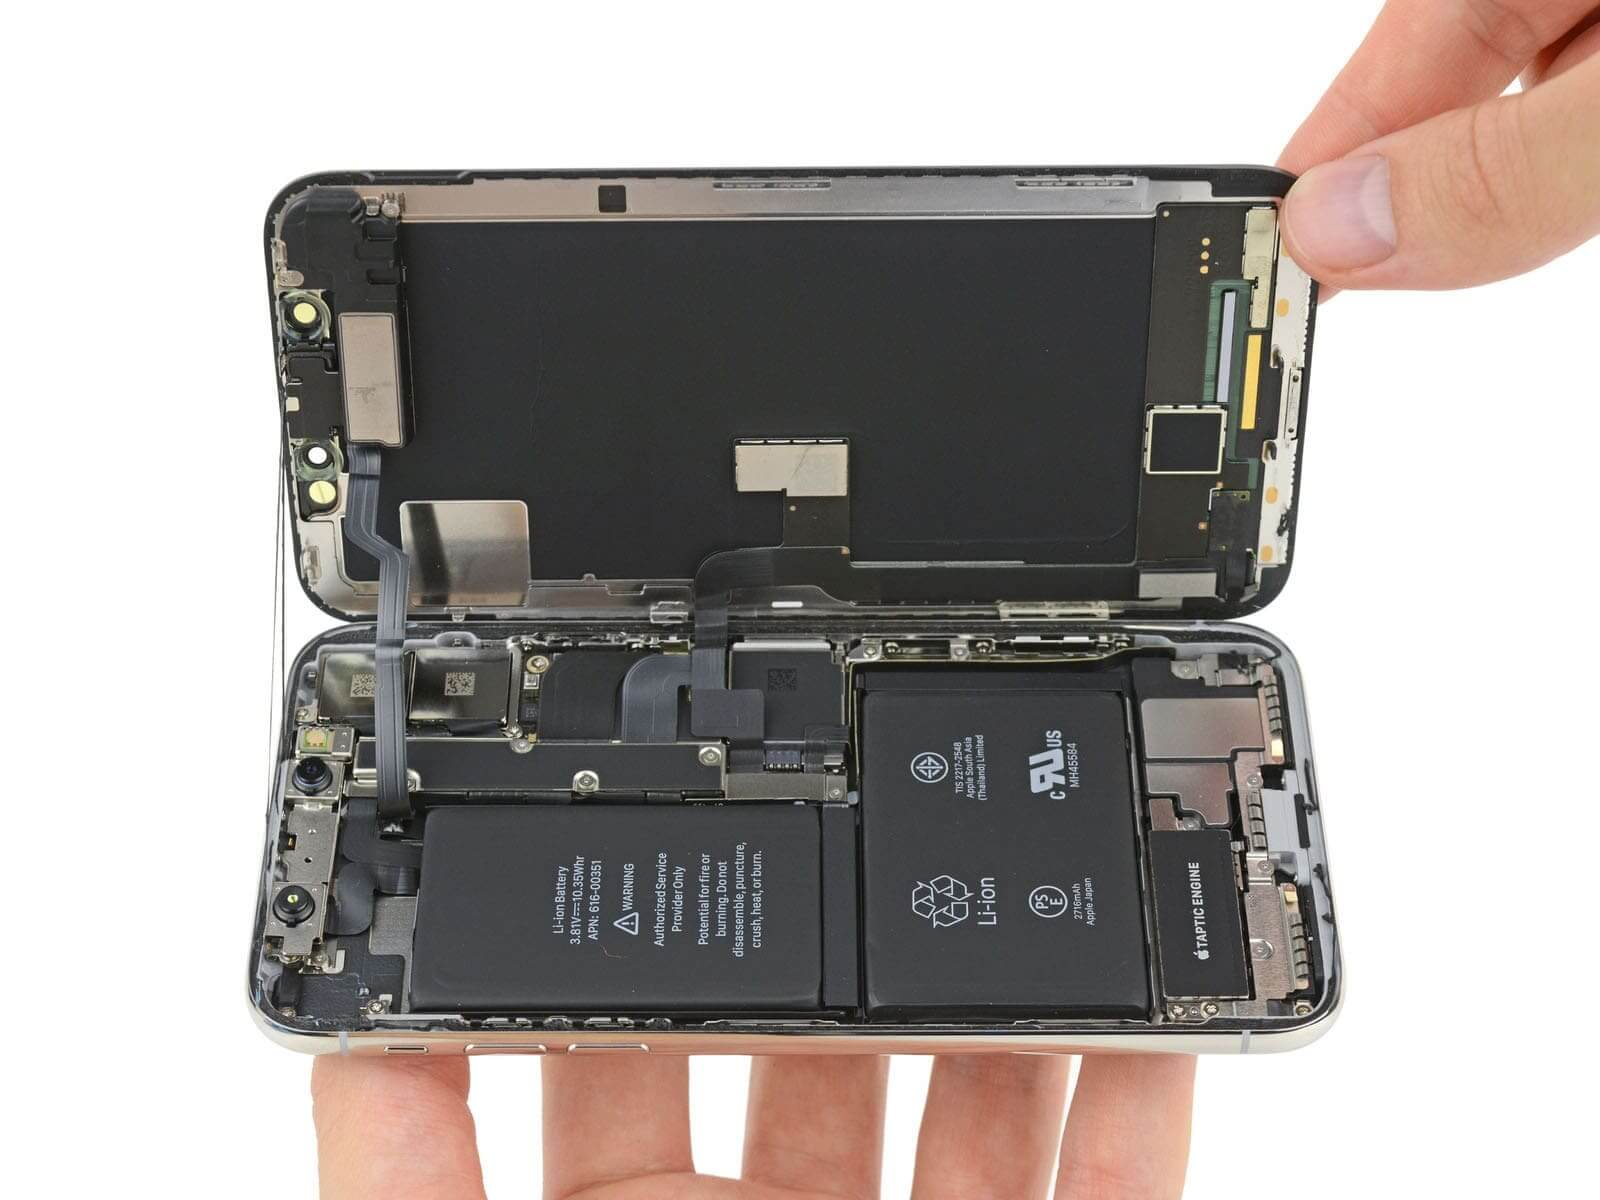 dđánh giá iphone x